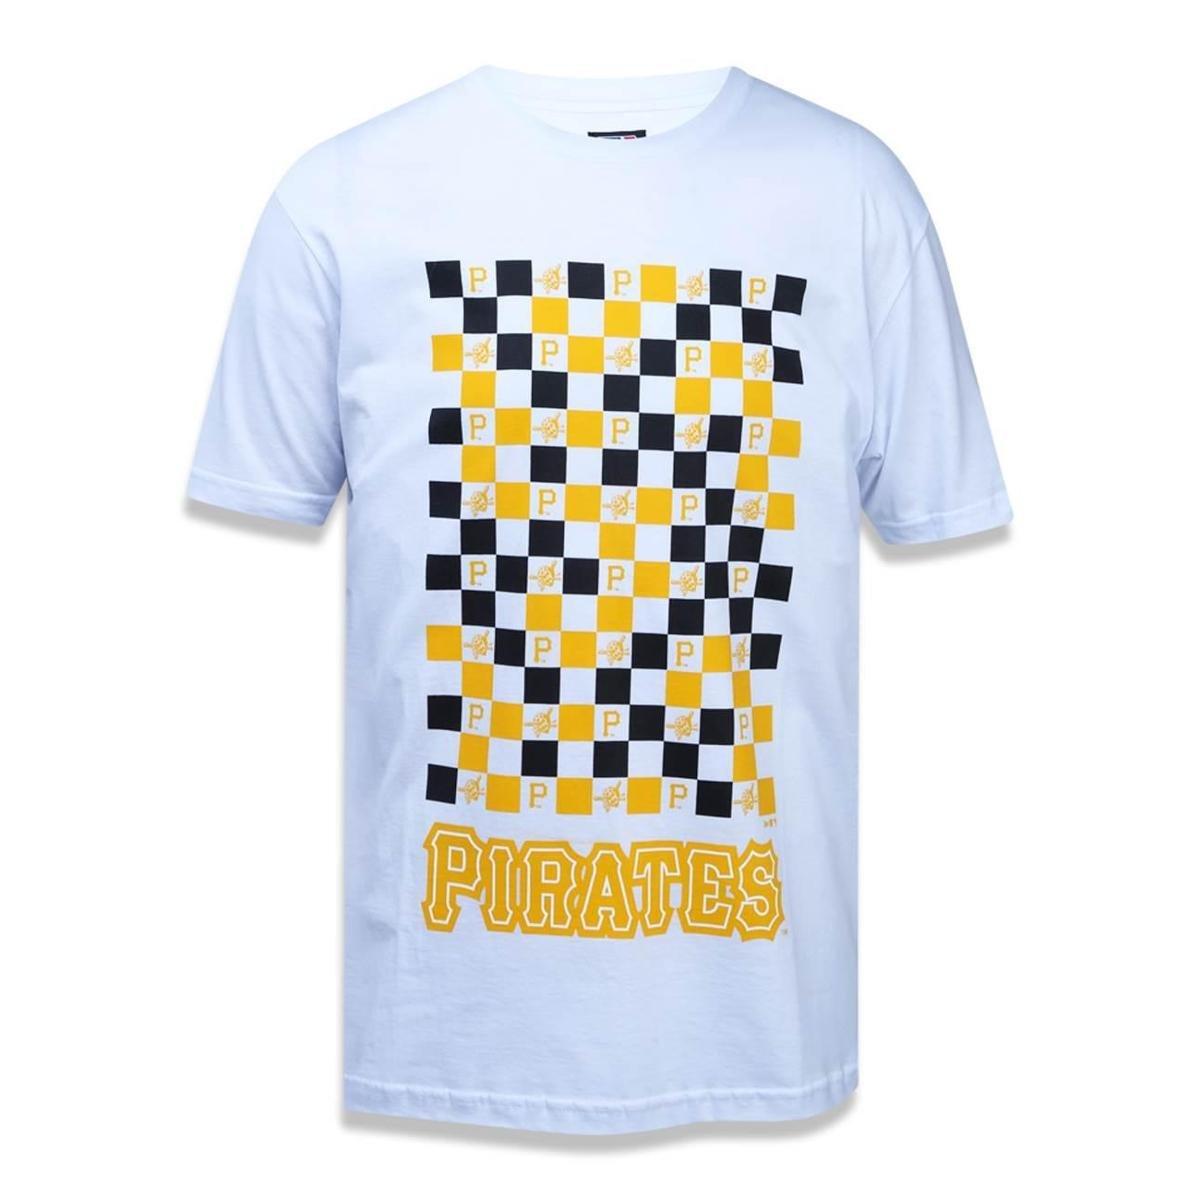 Camiseta Pittsburgh Pirates MLB New Era Masculina - Branco - Compre ... 252c16e9a21